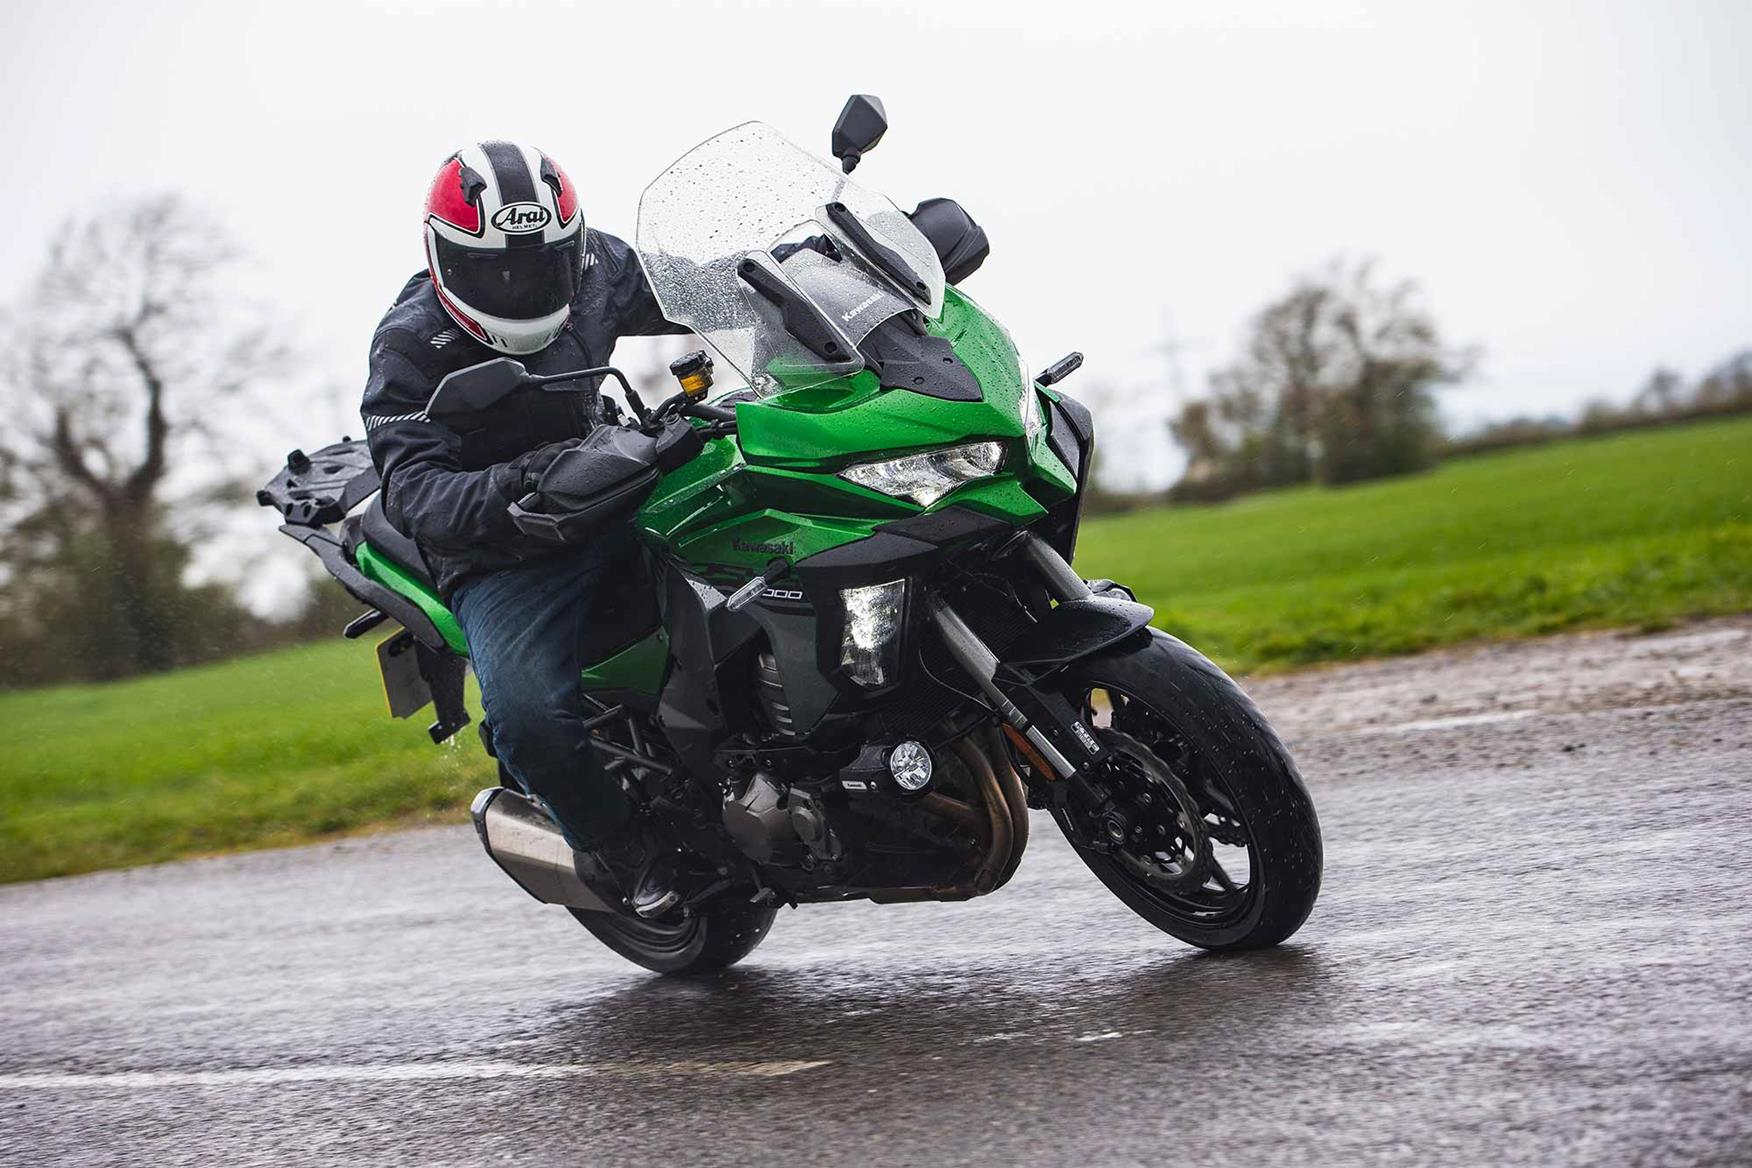 Cornering in the rain on the Kawasaki Versys 1000 SE